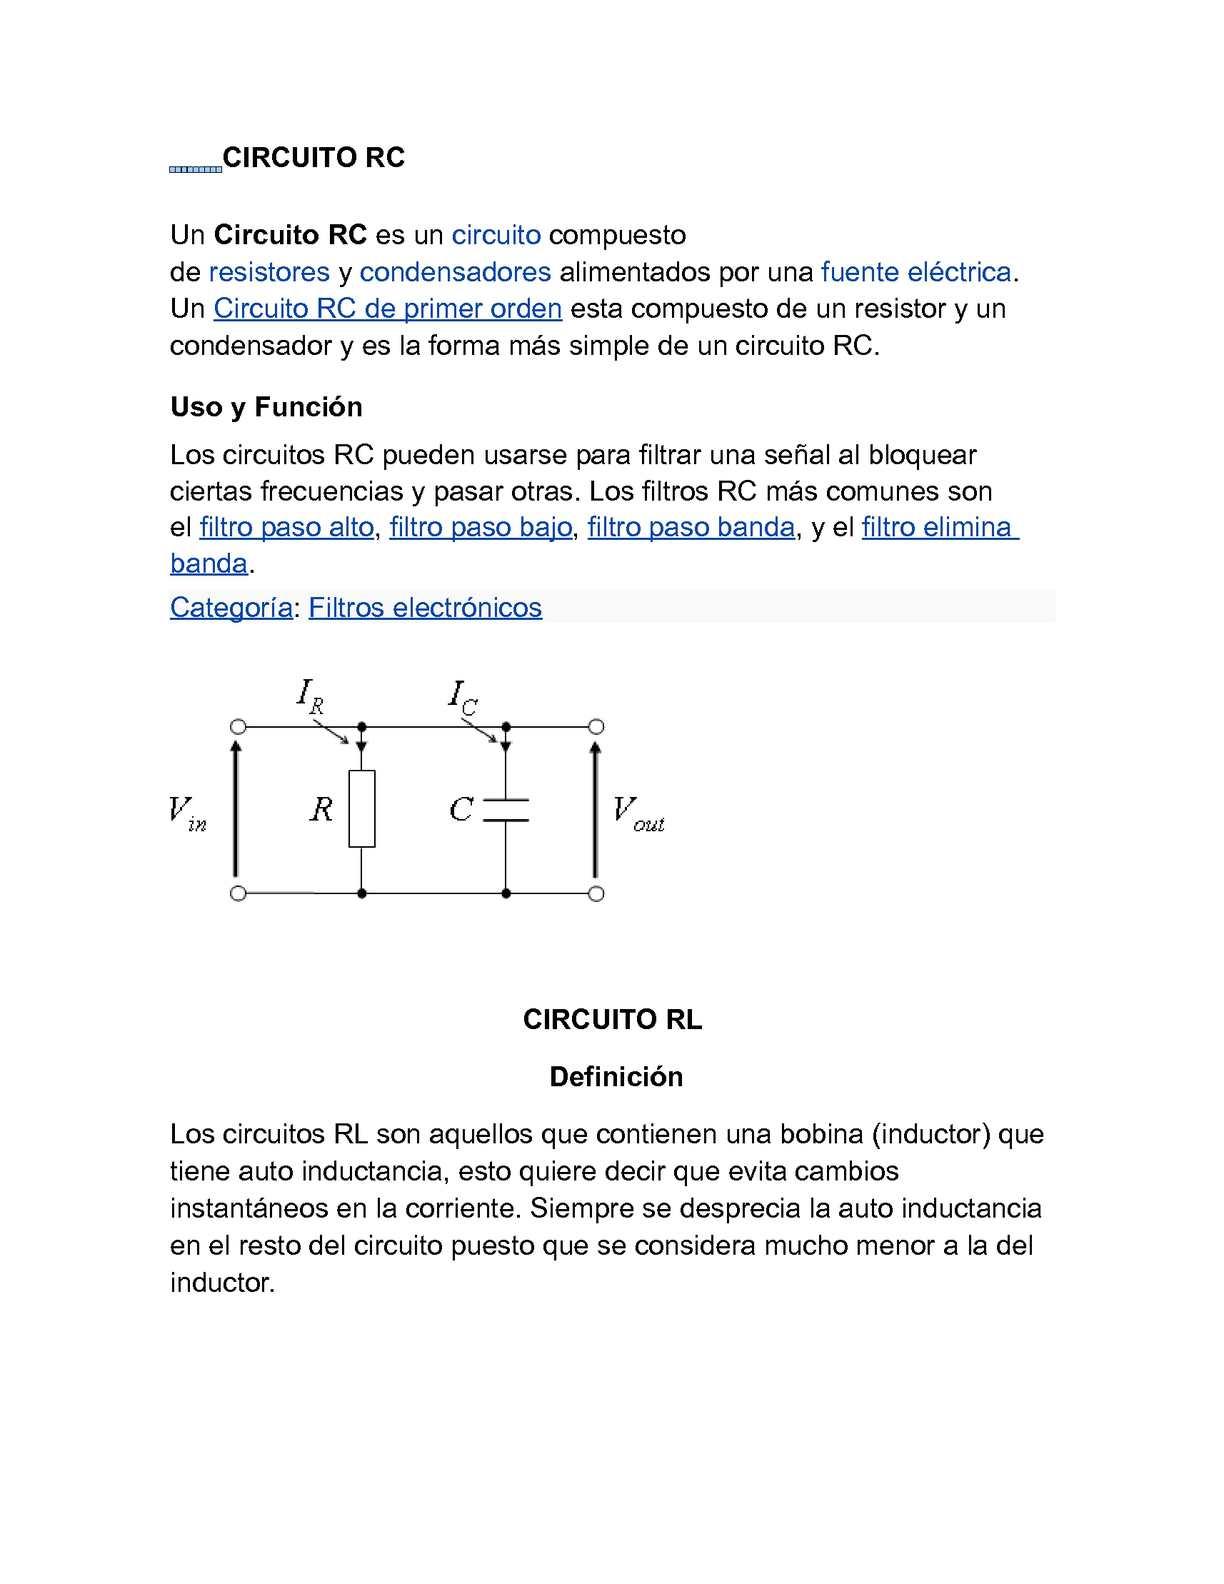 Circuito Lc : Ejercicios resueltos de circuitos rc